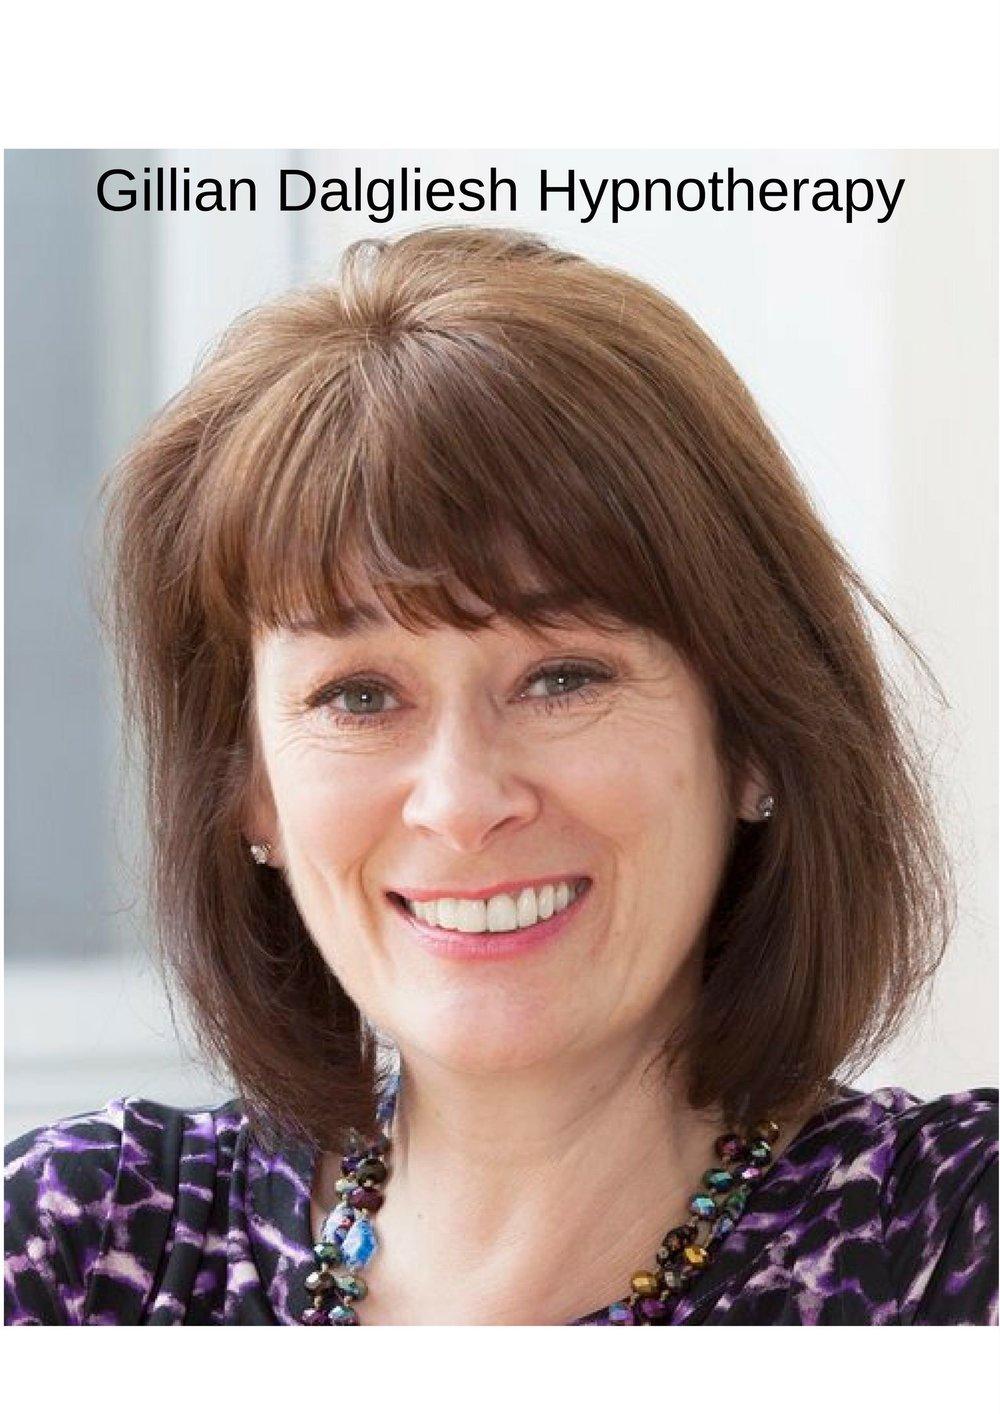 Gillian Dagleish Hypnotherapy